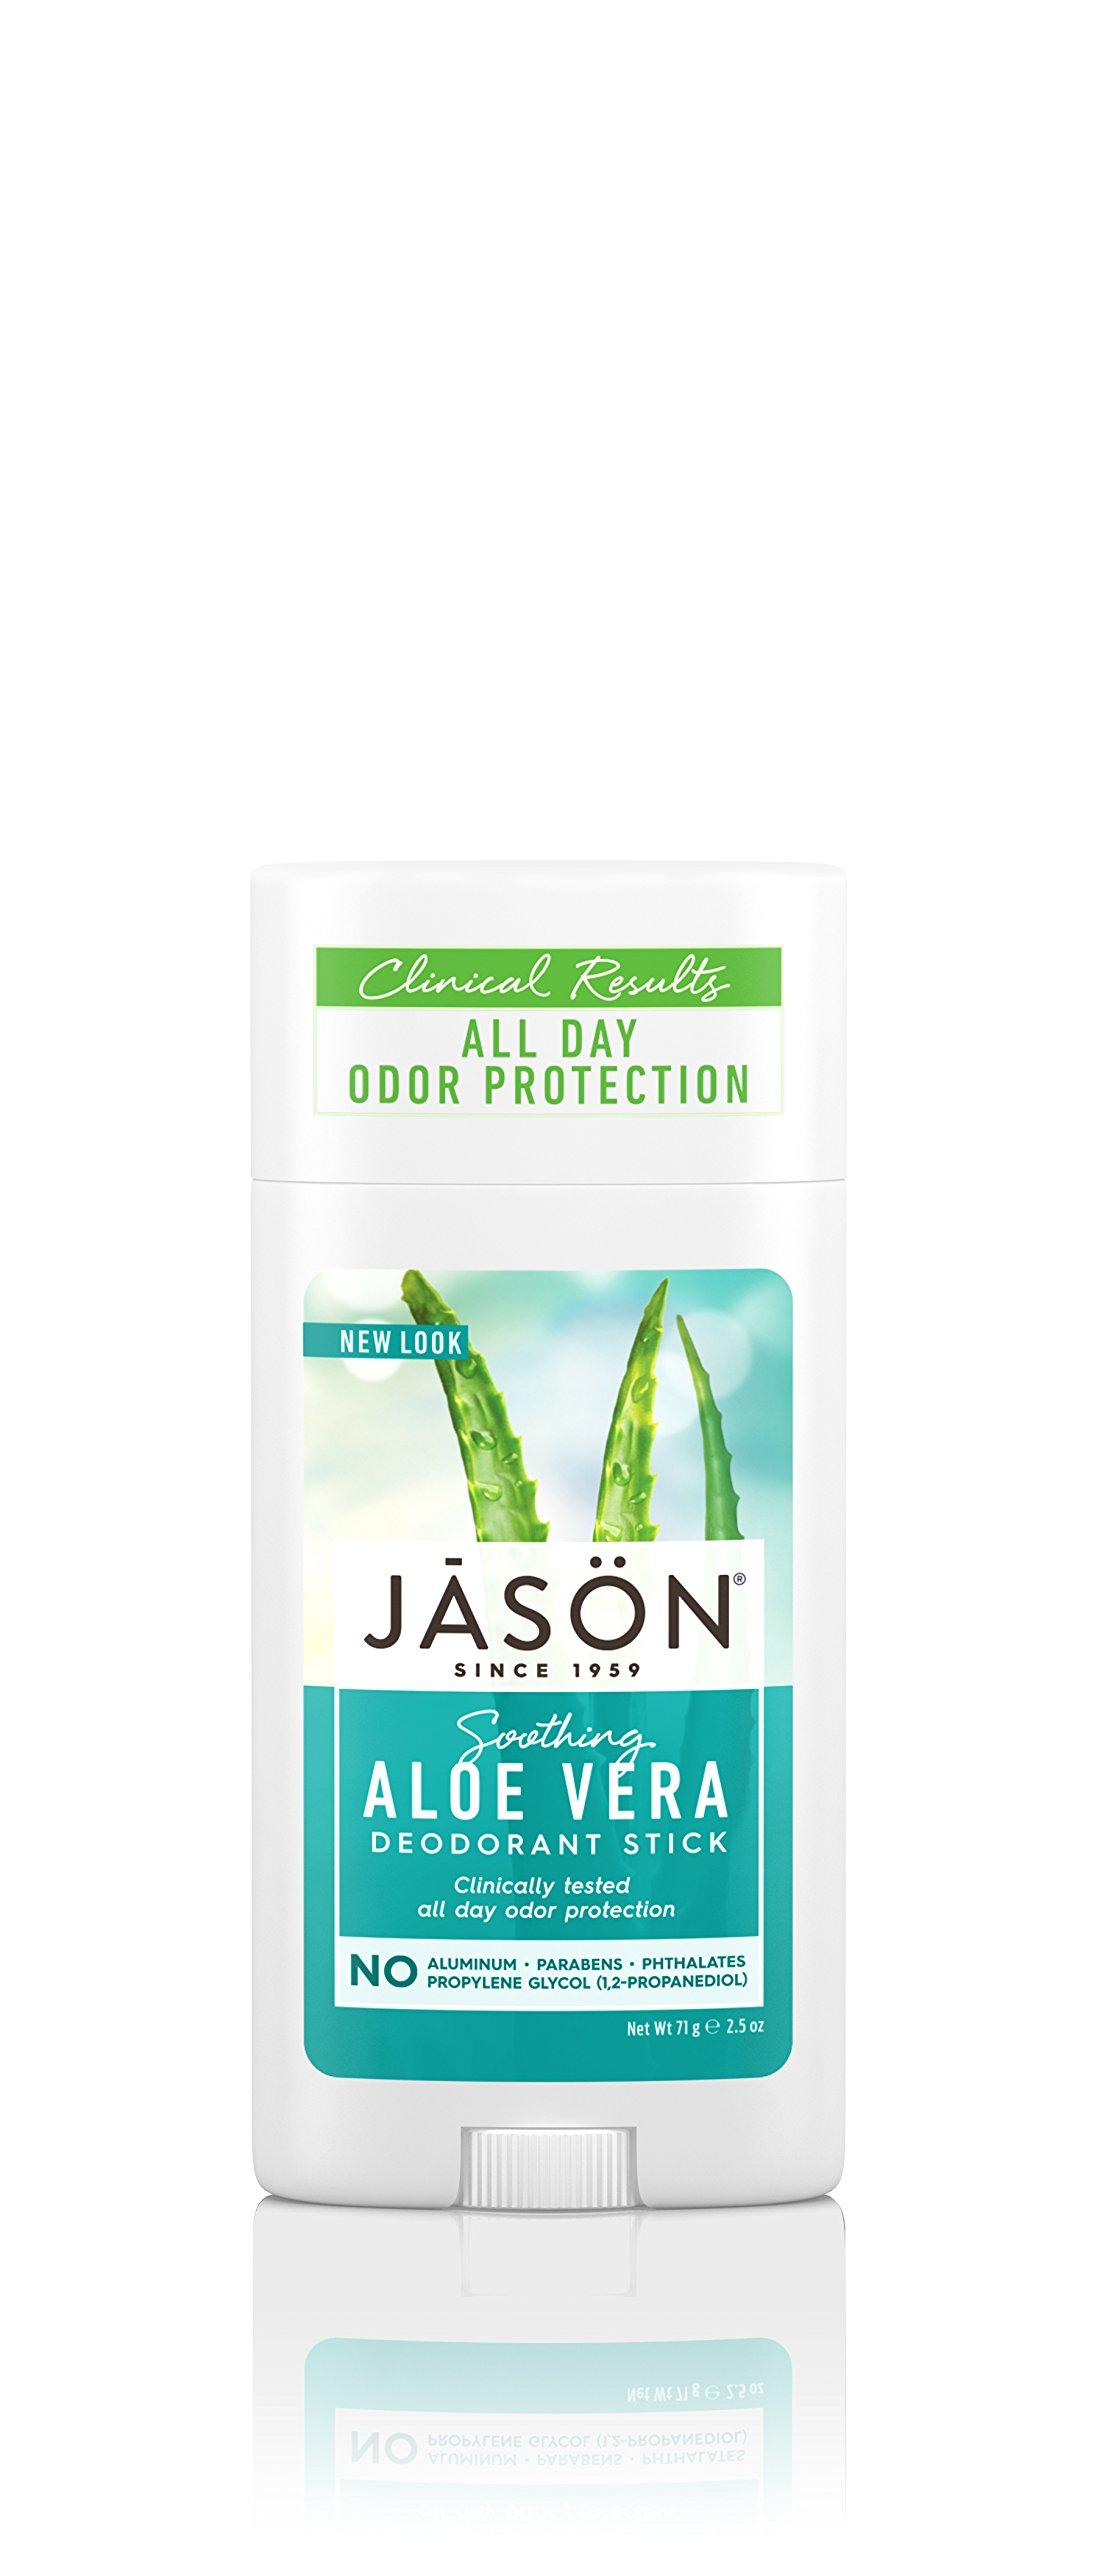 Jason Soothing Aloe Vera Aluminum and Paraben Free Deodorant Stick, 2.5 Ounce